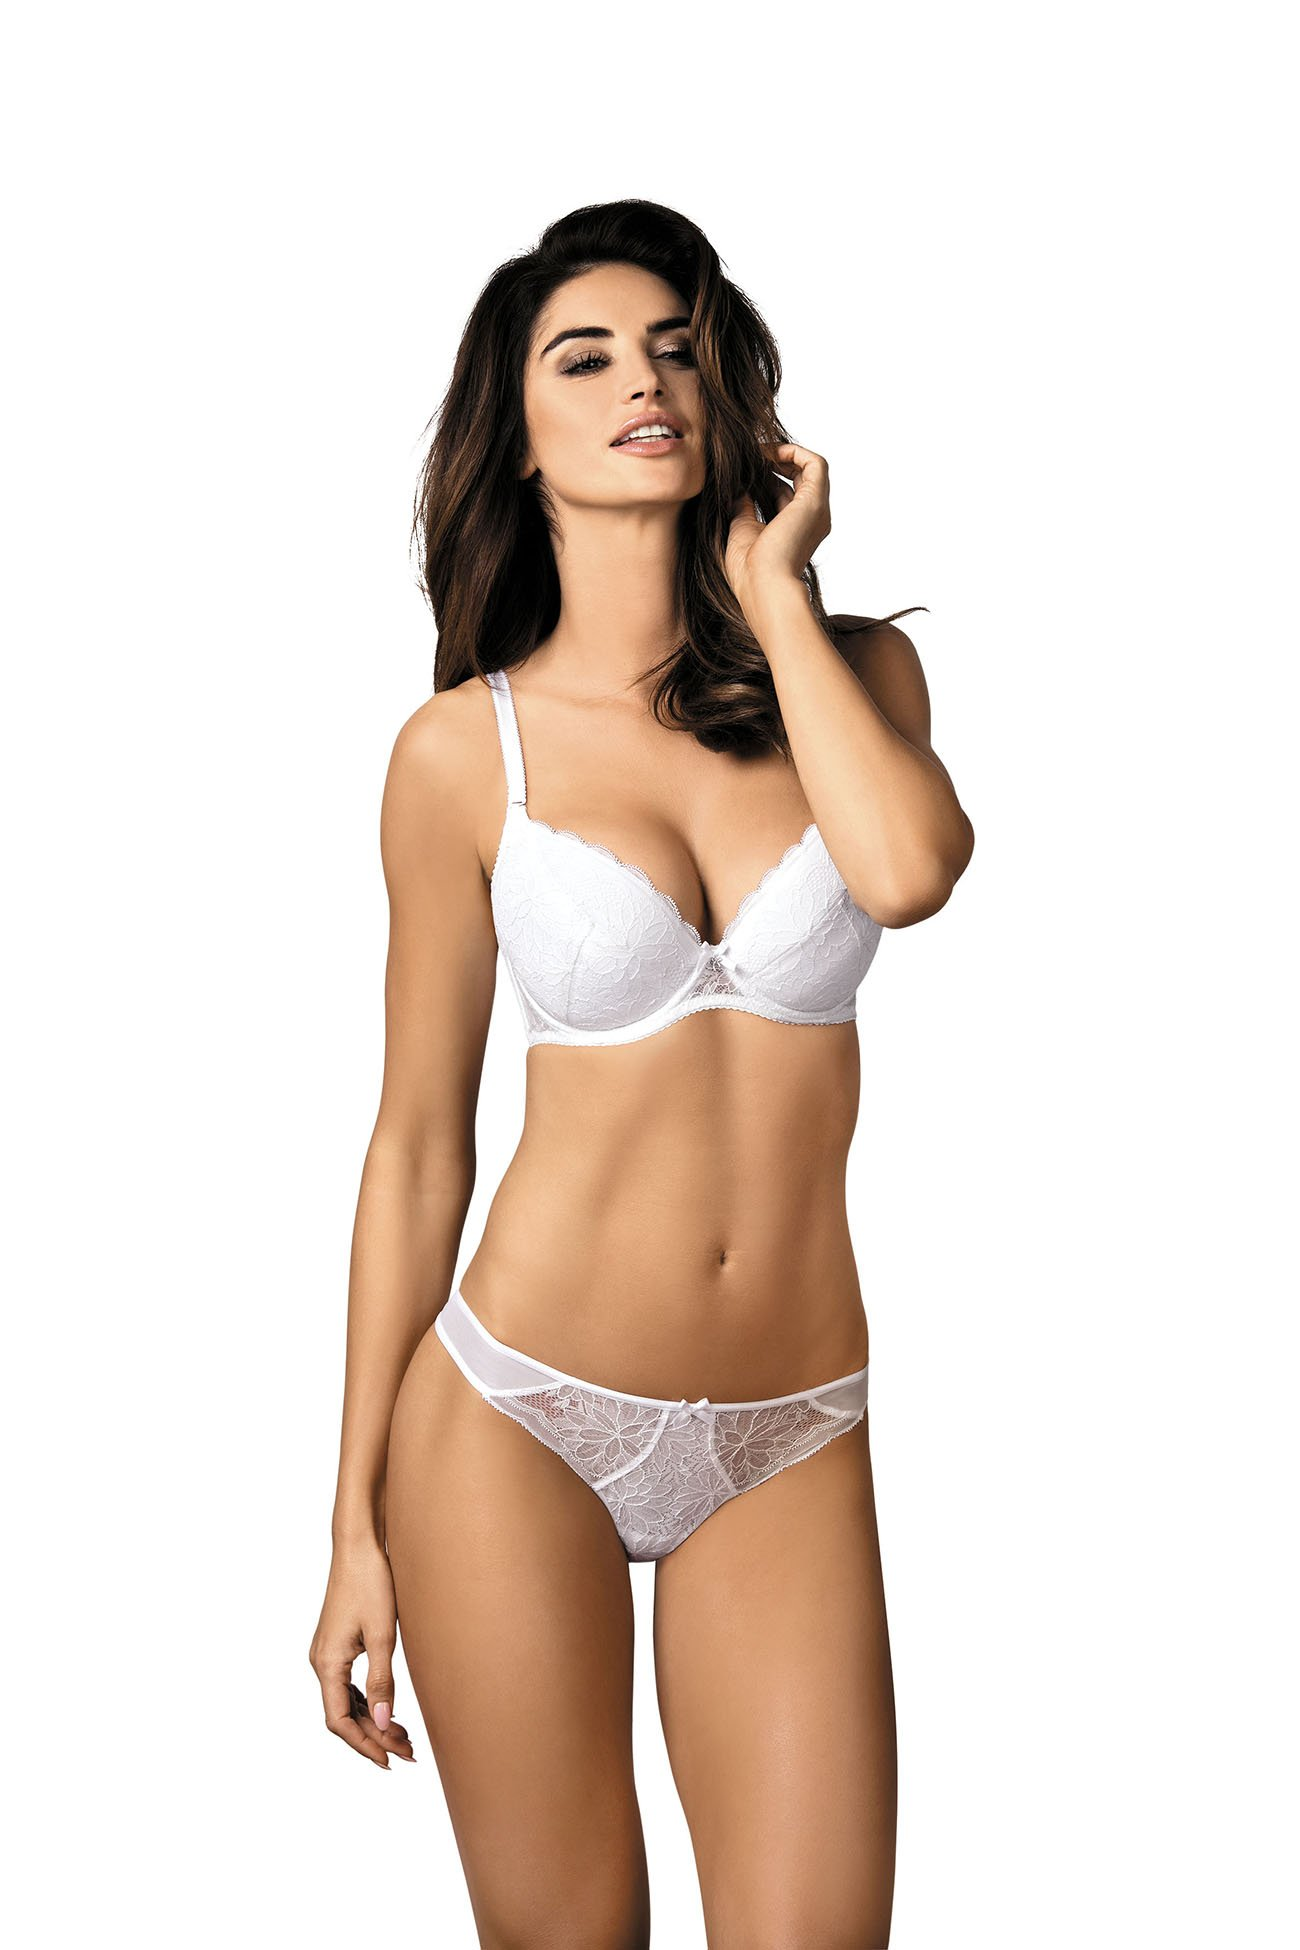 5da59fe9abb3 Gorteks Alexis/B1 push-up bra white Classic collection